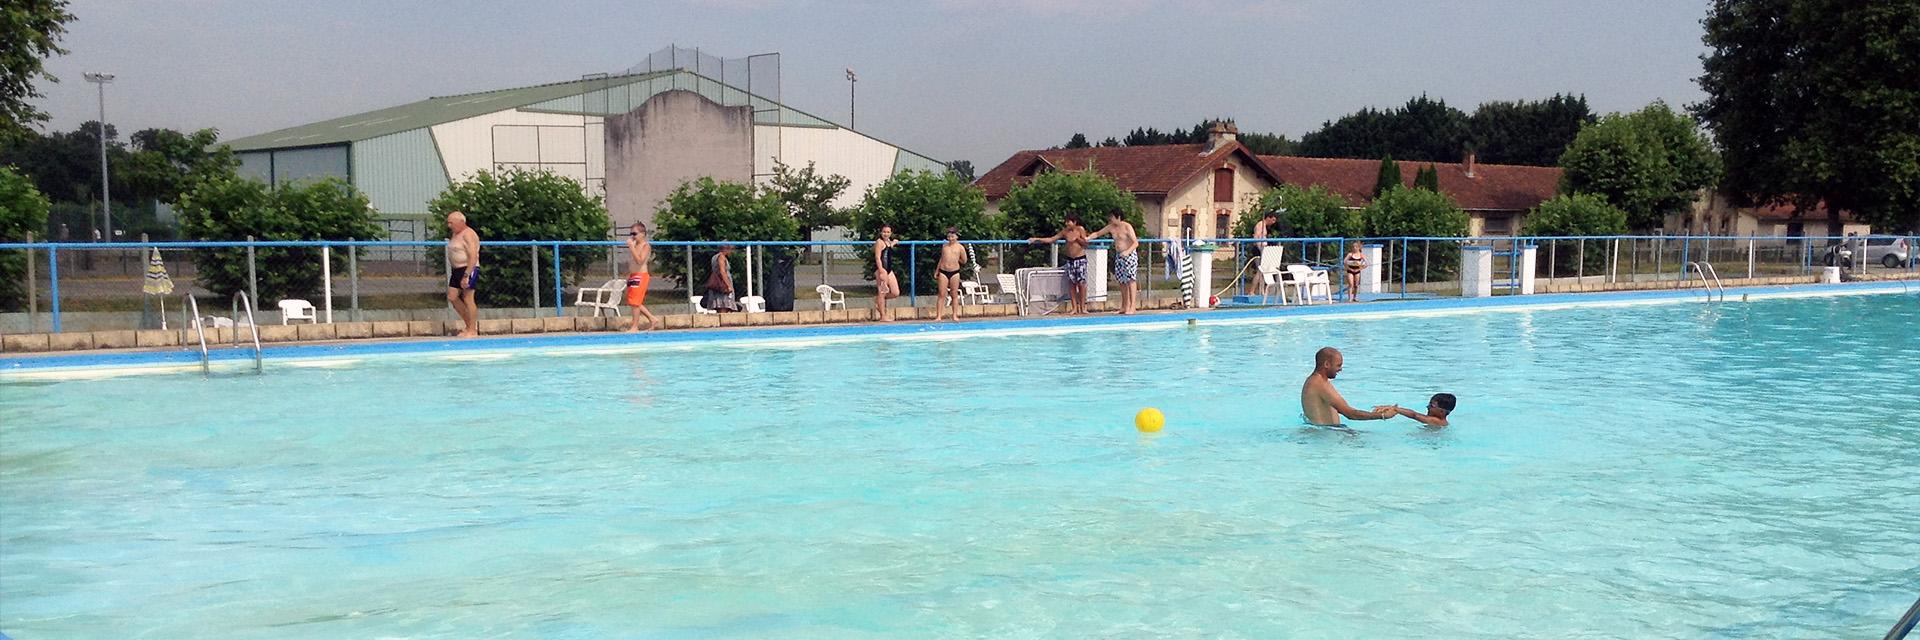 Village_club_vacances_aveyron-cantal-ardèche-chataigneraie-piscine